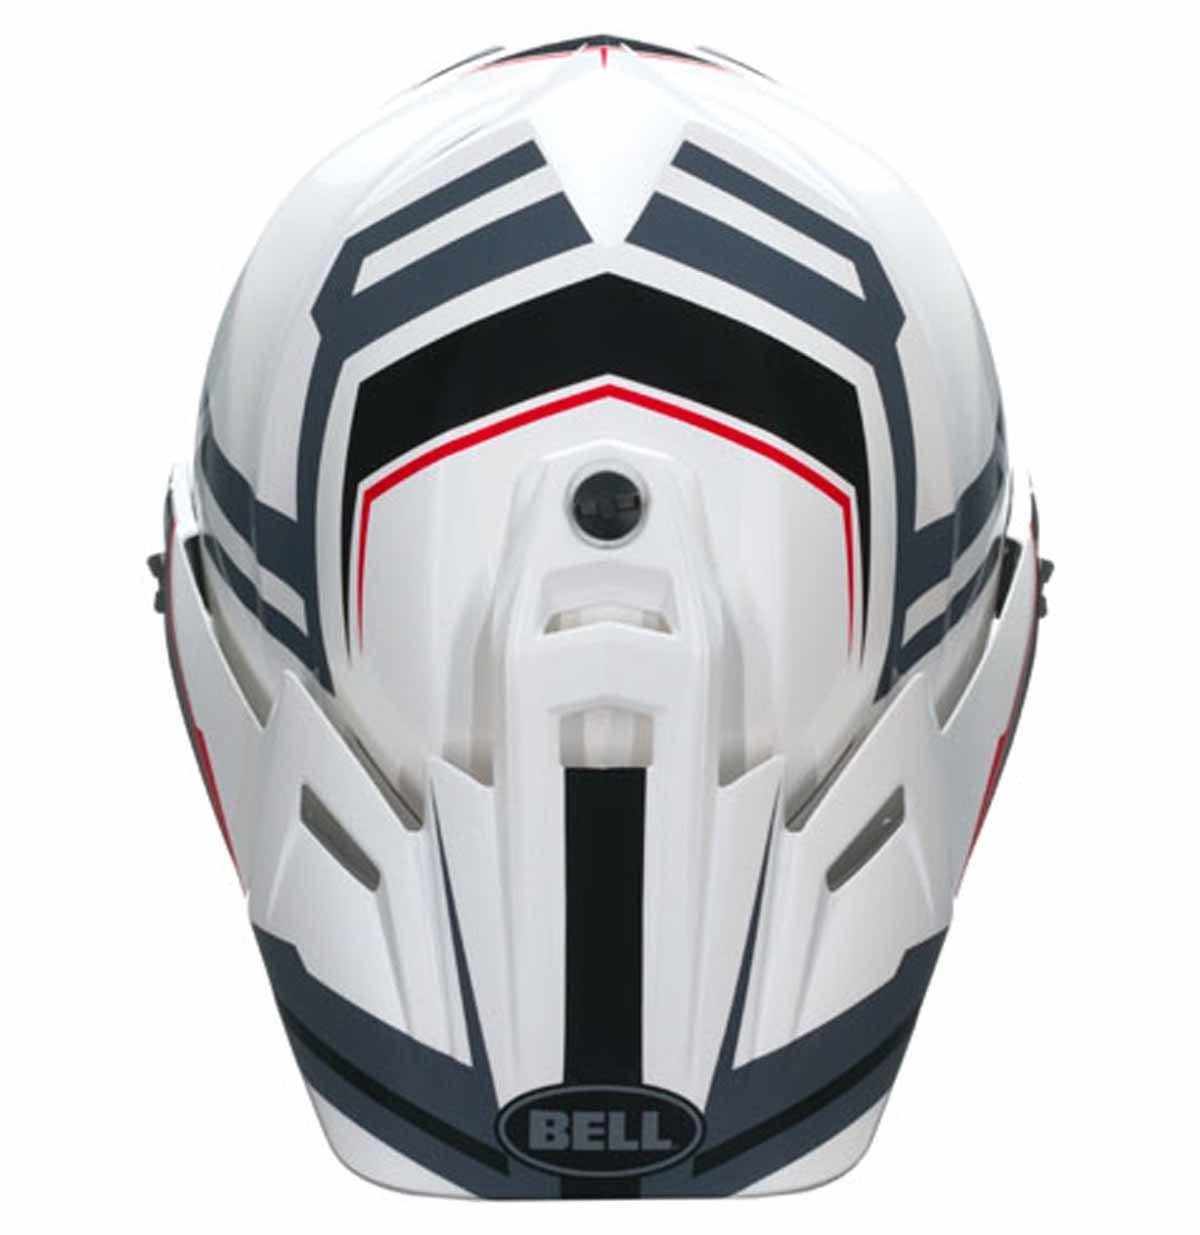 Bell Dual Sport Helmet >> Bell MX-9 Adventure ADV Helmet Dual Sport Touring Motorcycle DOT | eBay